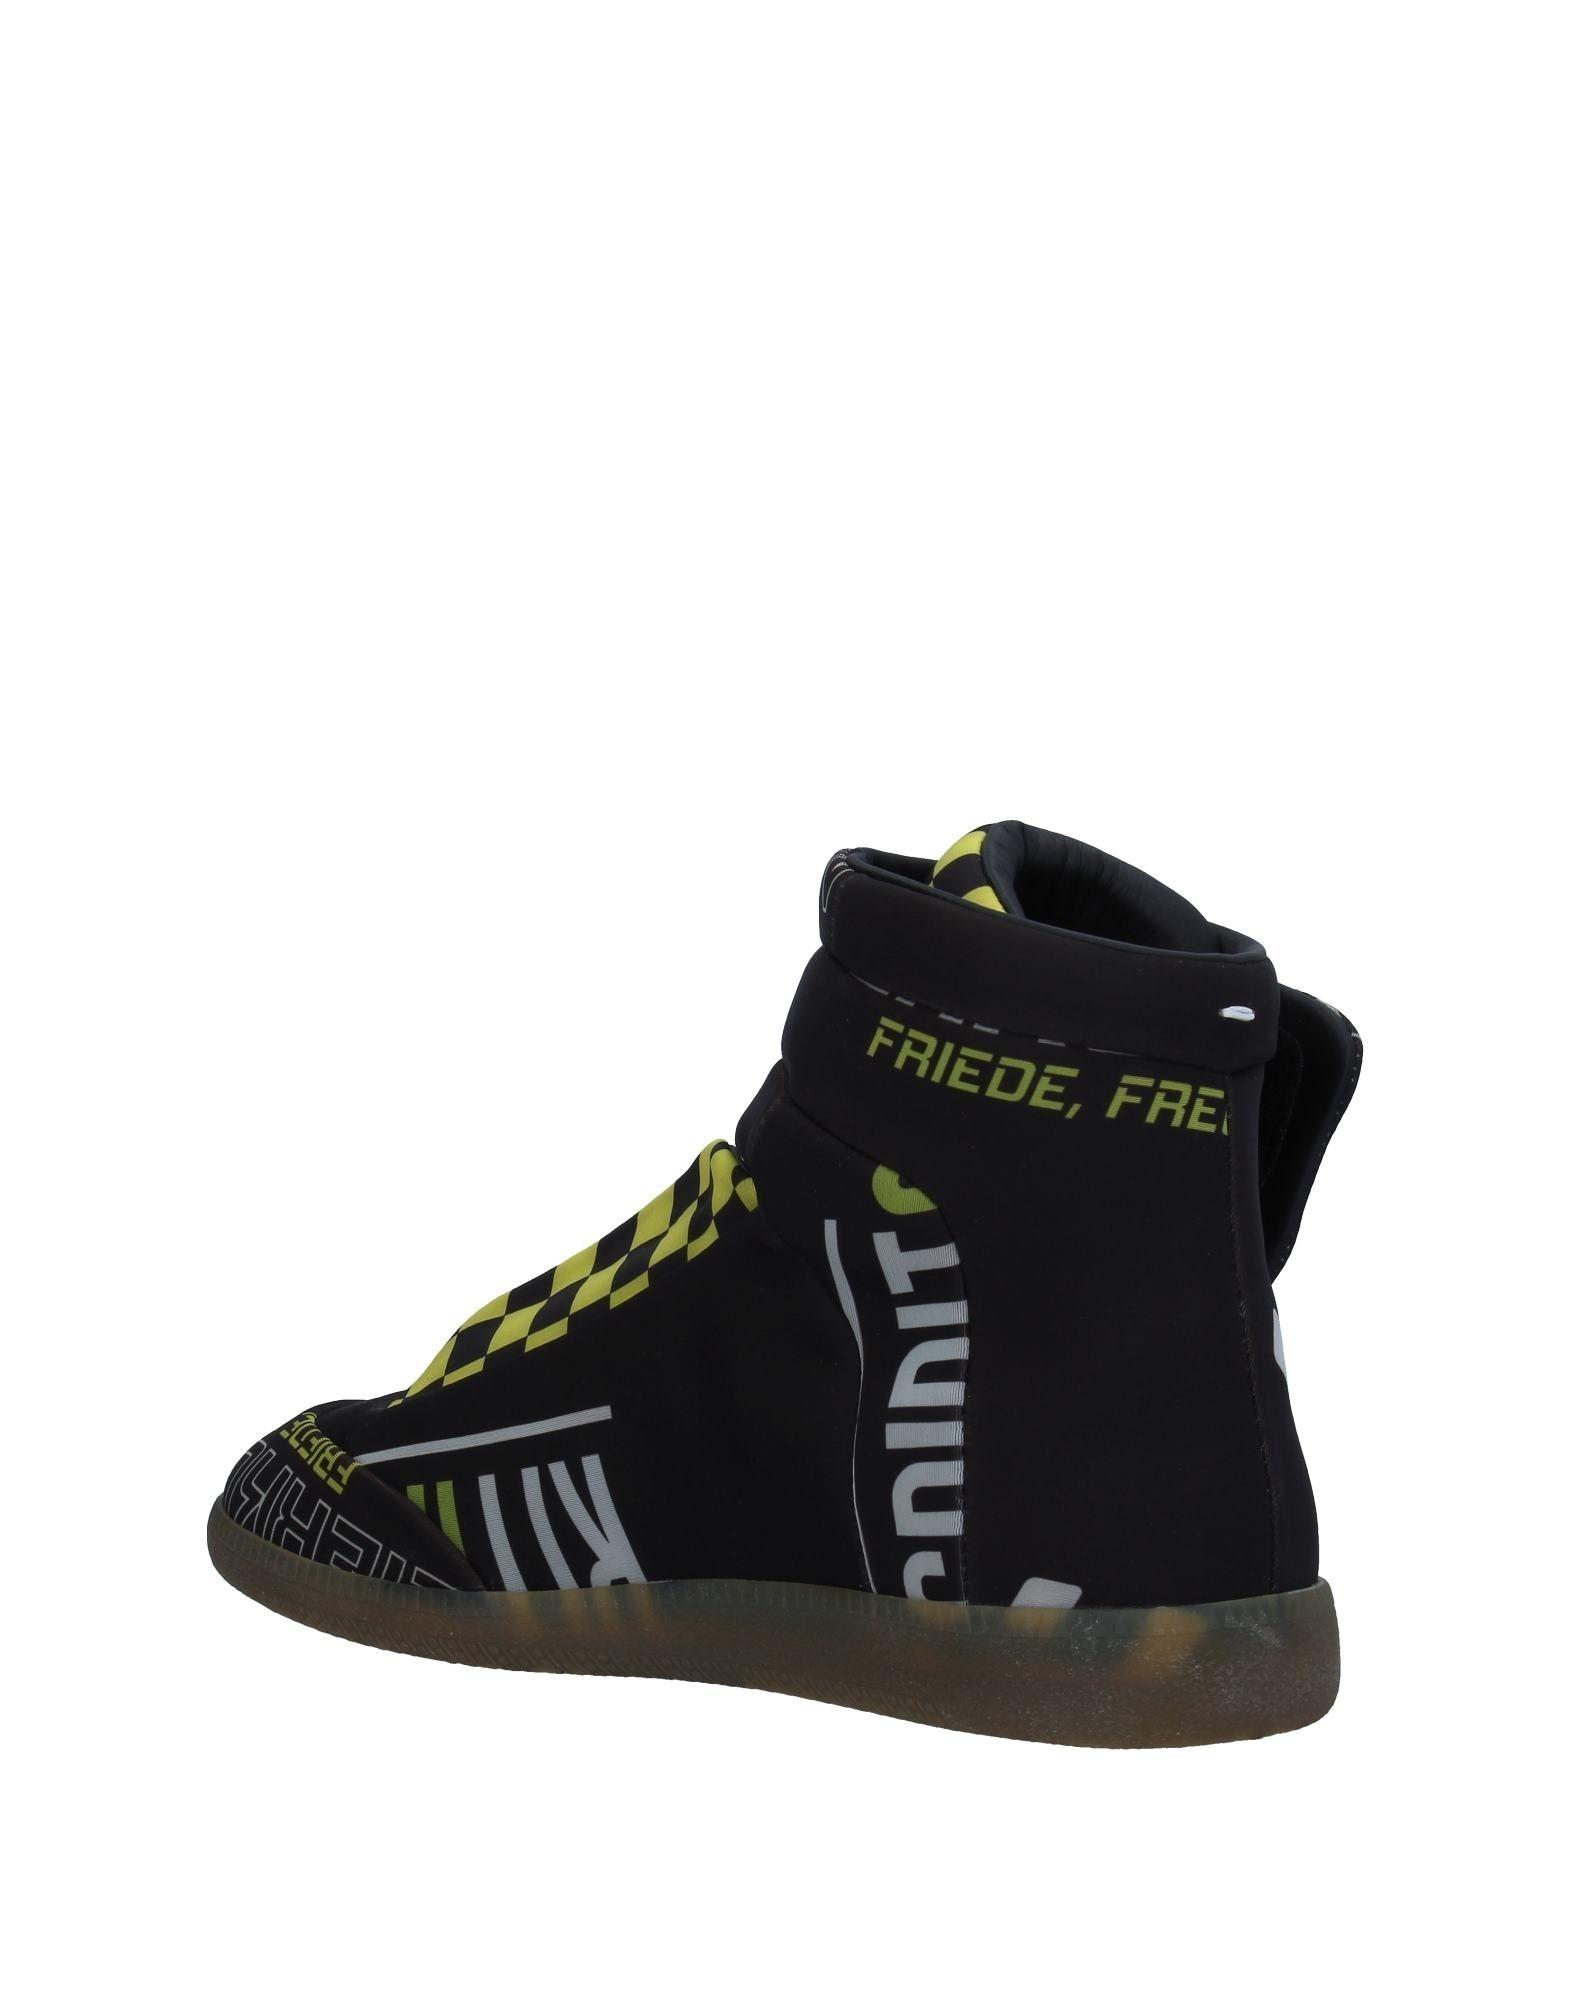 Maison Margiela Sneakers Sneakers Sneakers Herren  11334334HG 8272d6